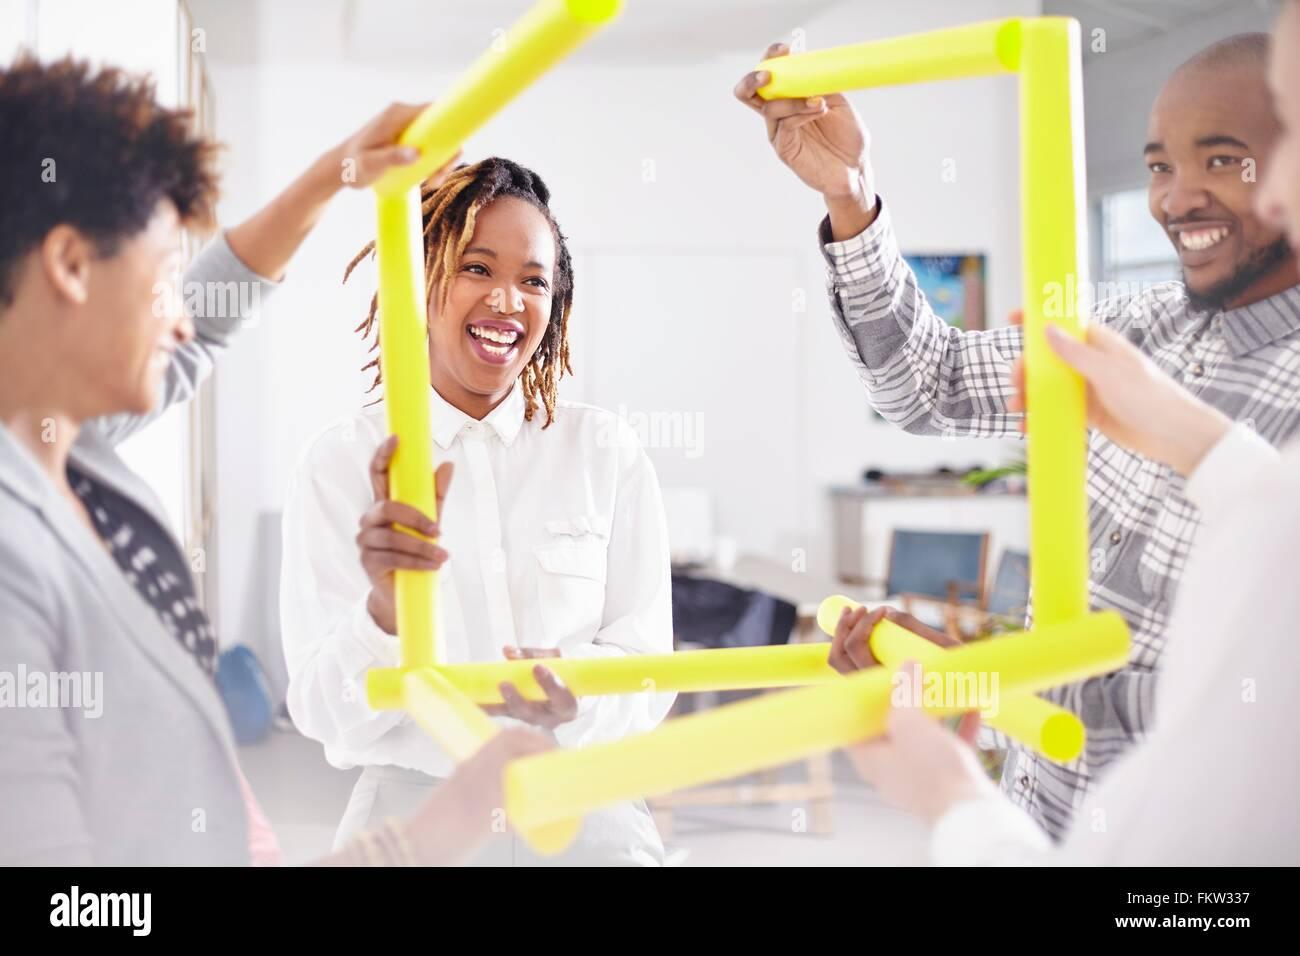 Colegas de team building holding tarea rubes amarilla sonriendo Imagen De Stock